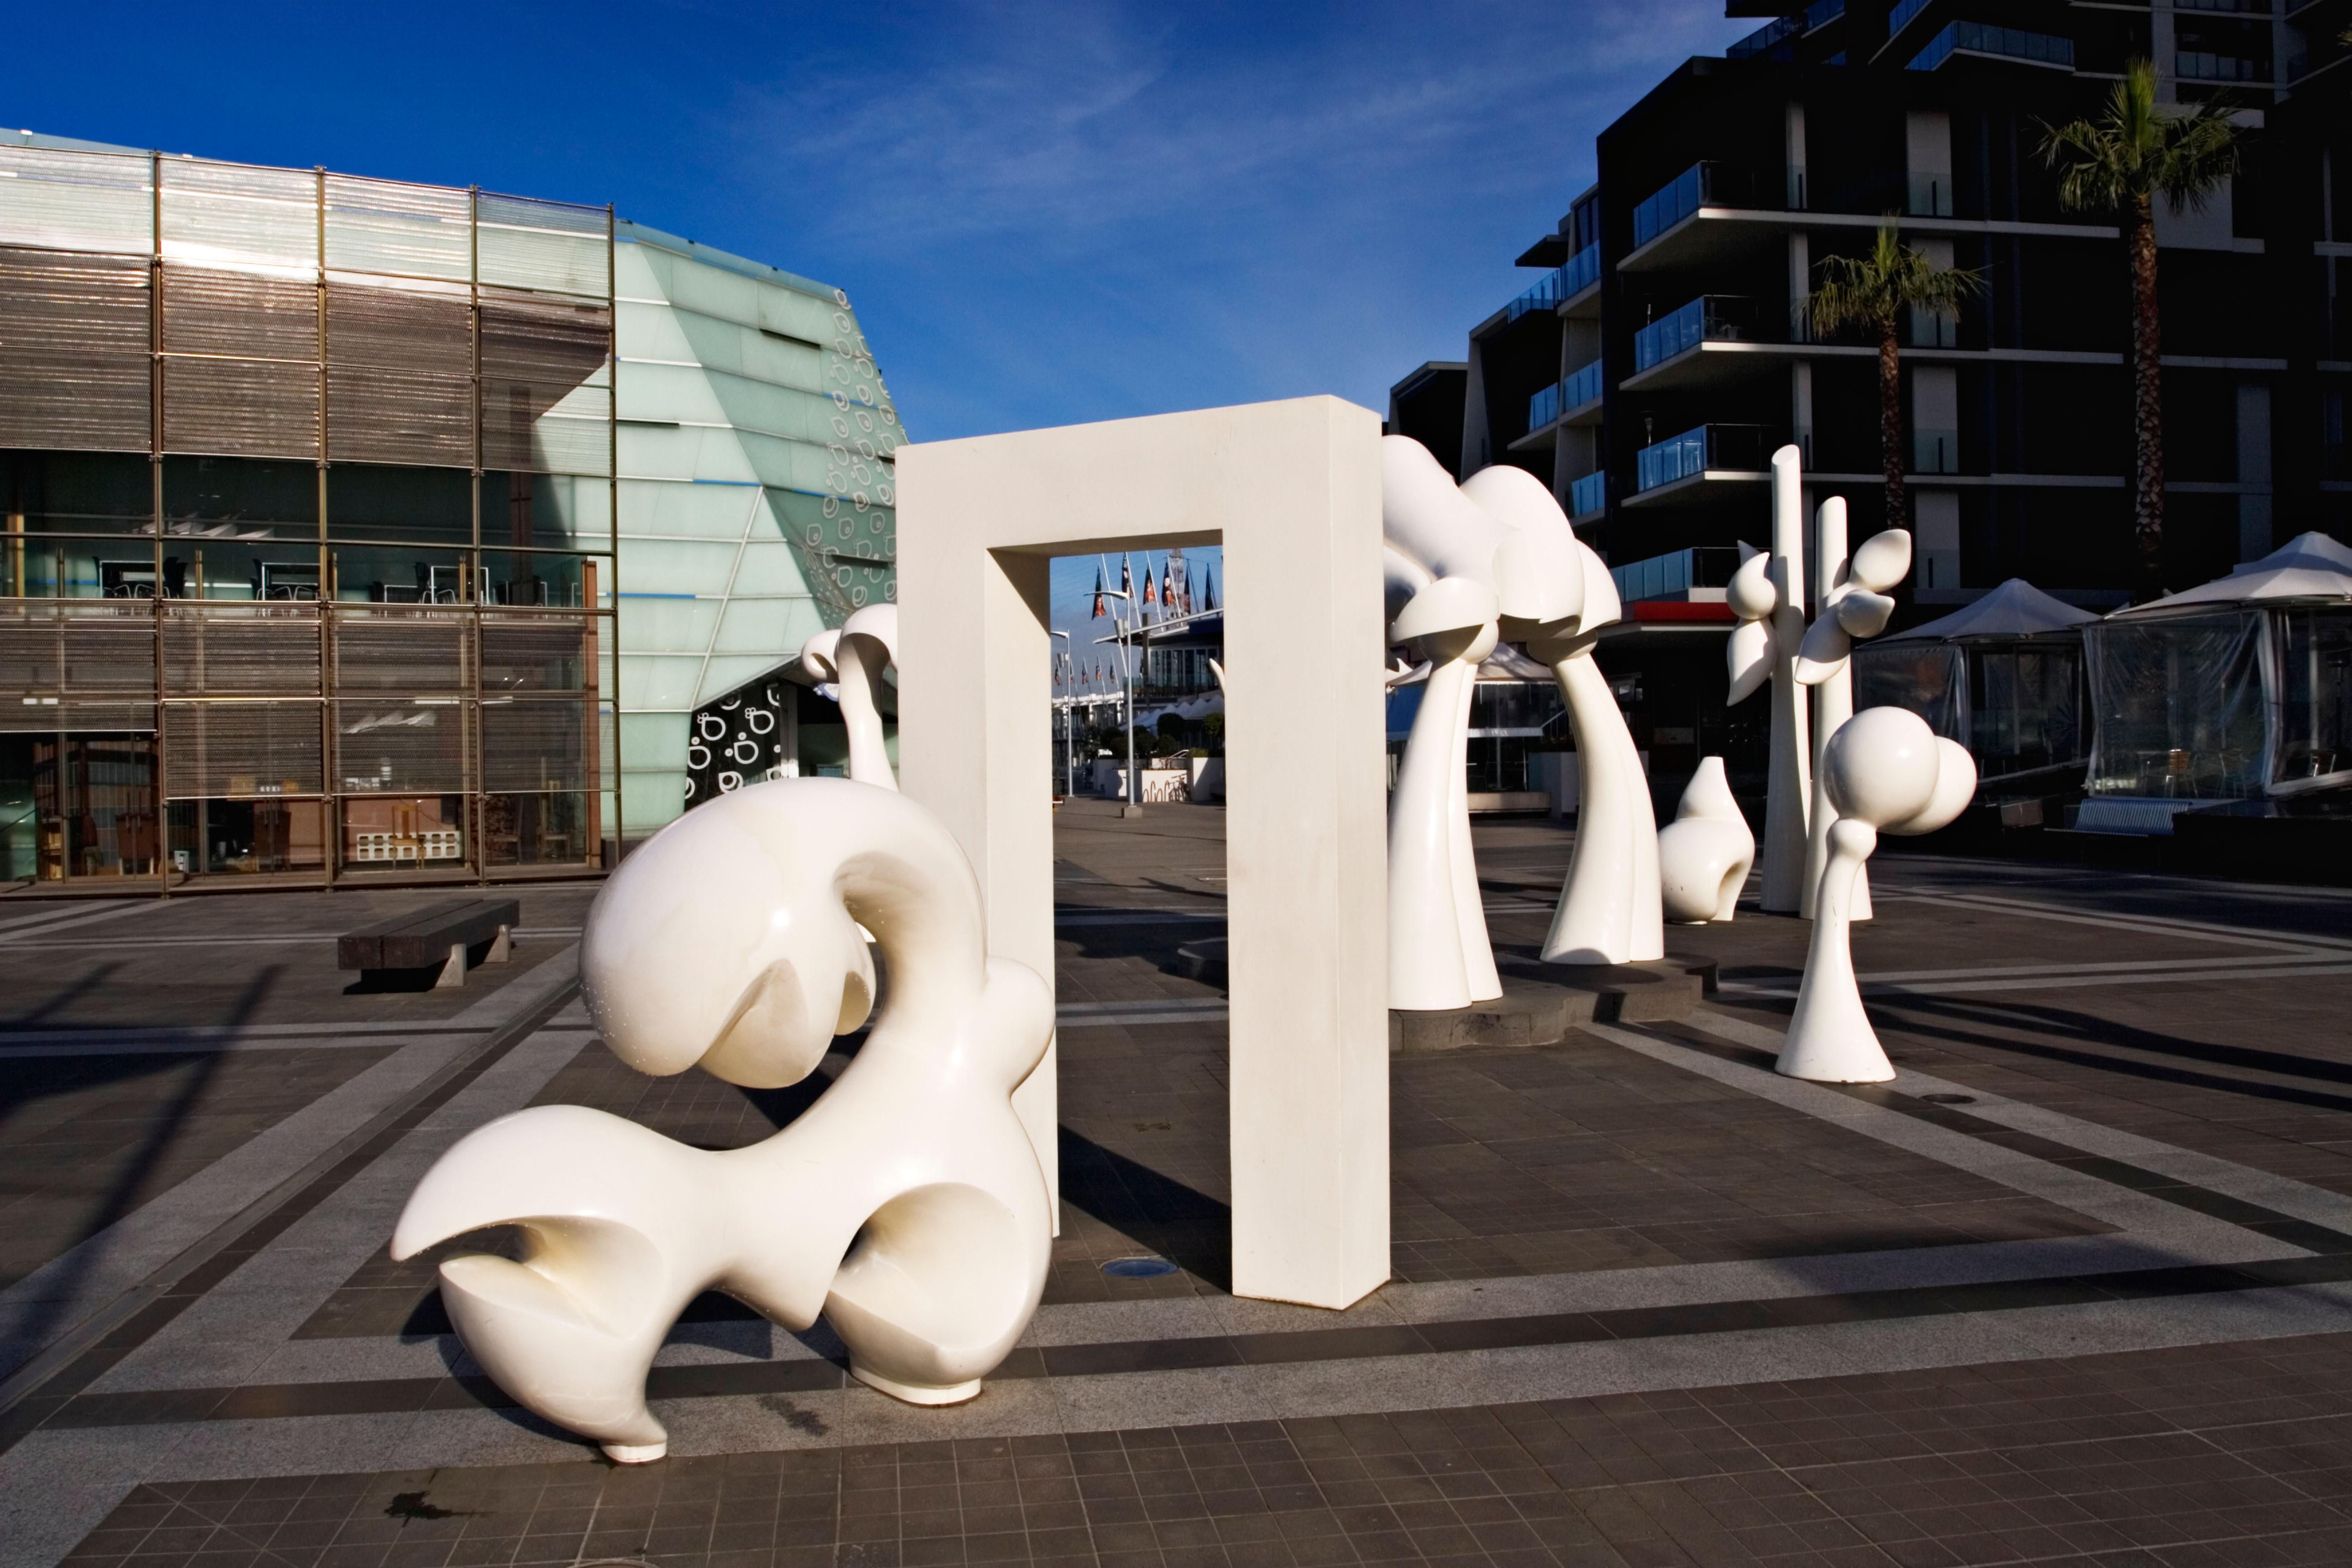 Sculptures in Melbourne Docklands in Melbourne Victoria Australia.